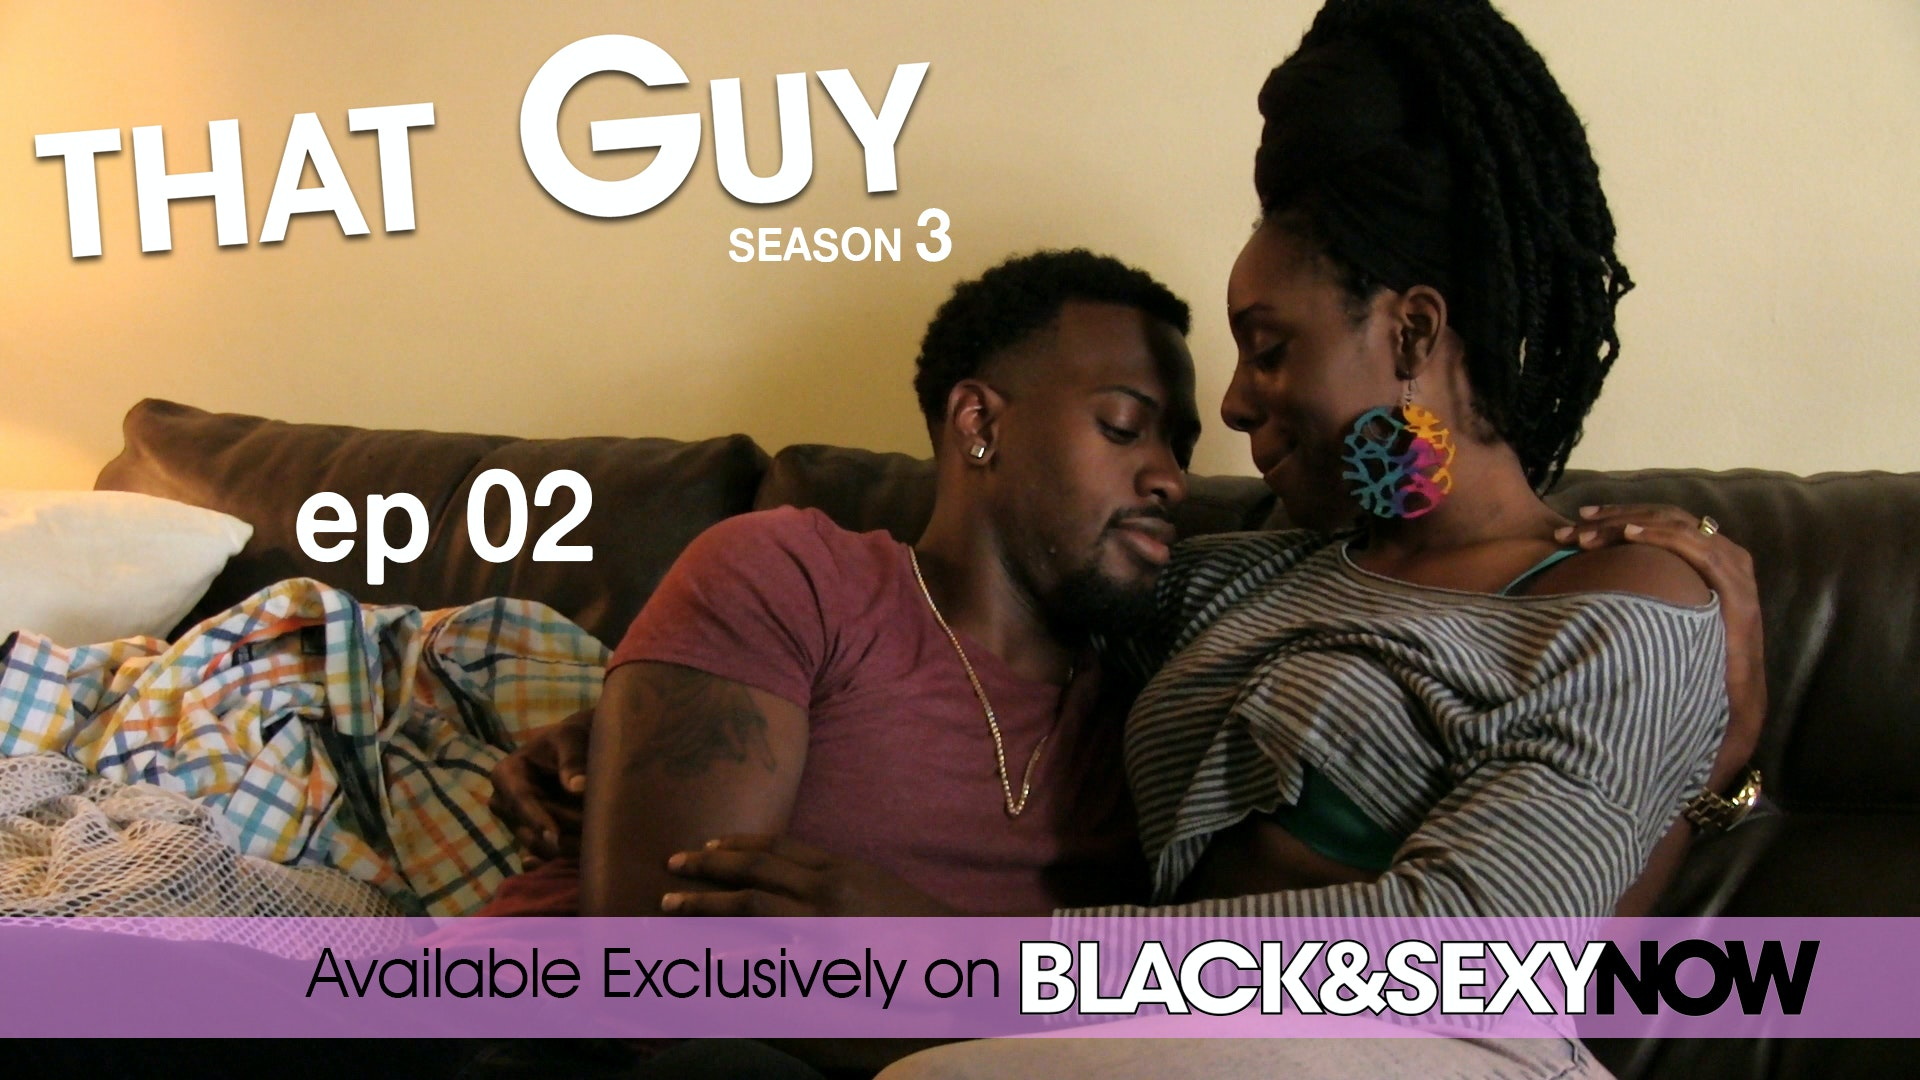 That guy blackandsexytv cast